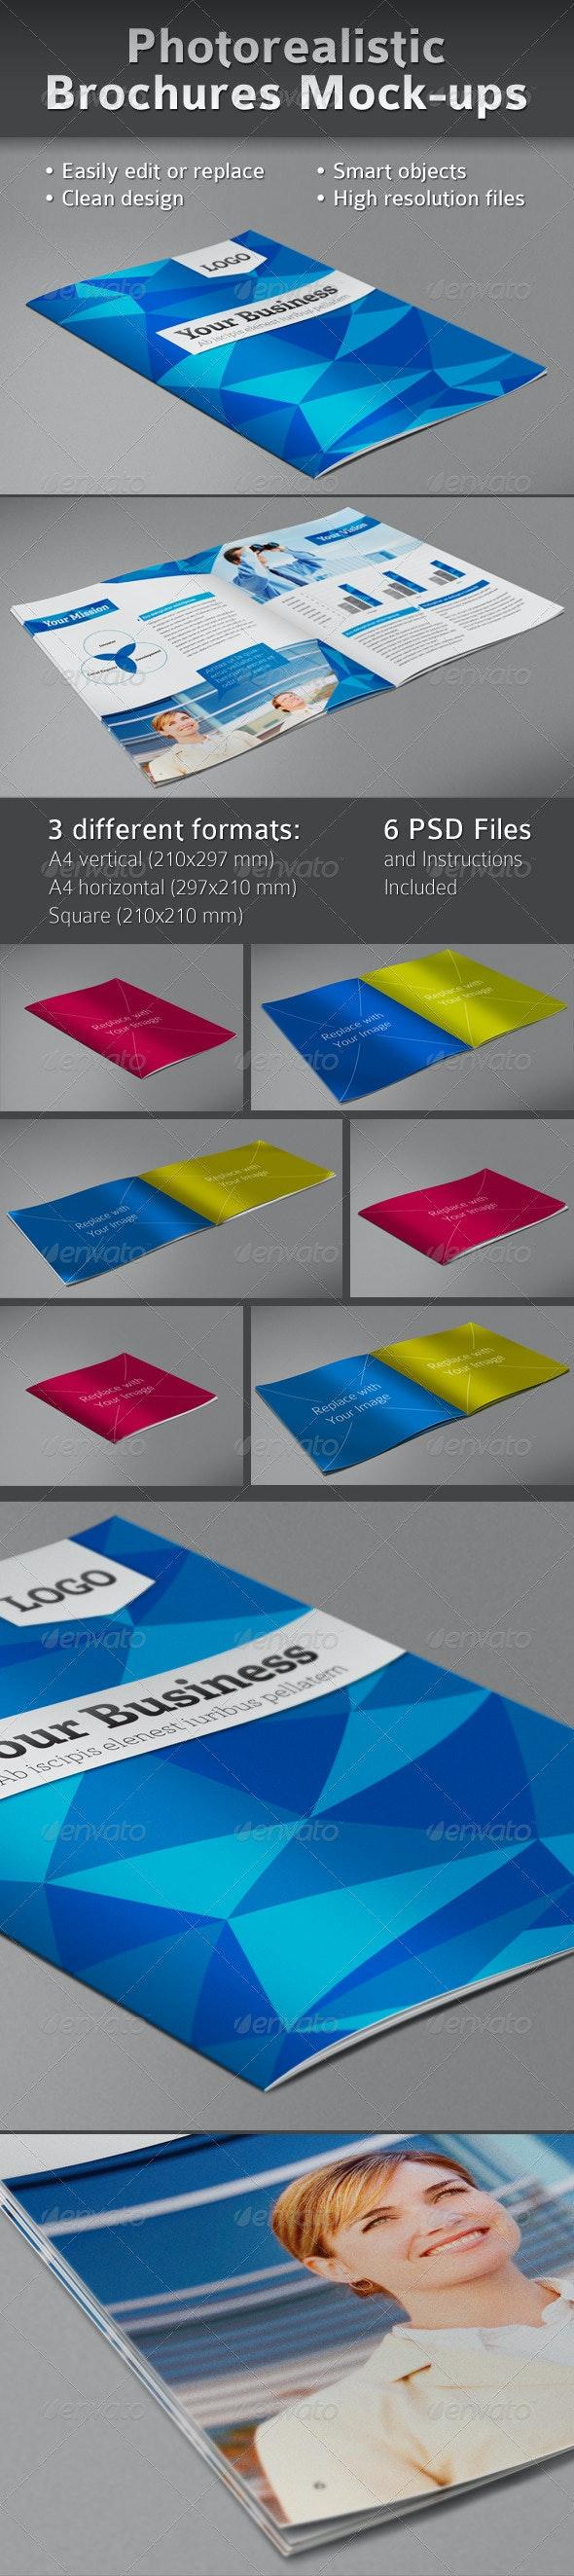 Photorealistic Brochures Preview Mock-ups - Brochures Print